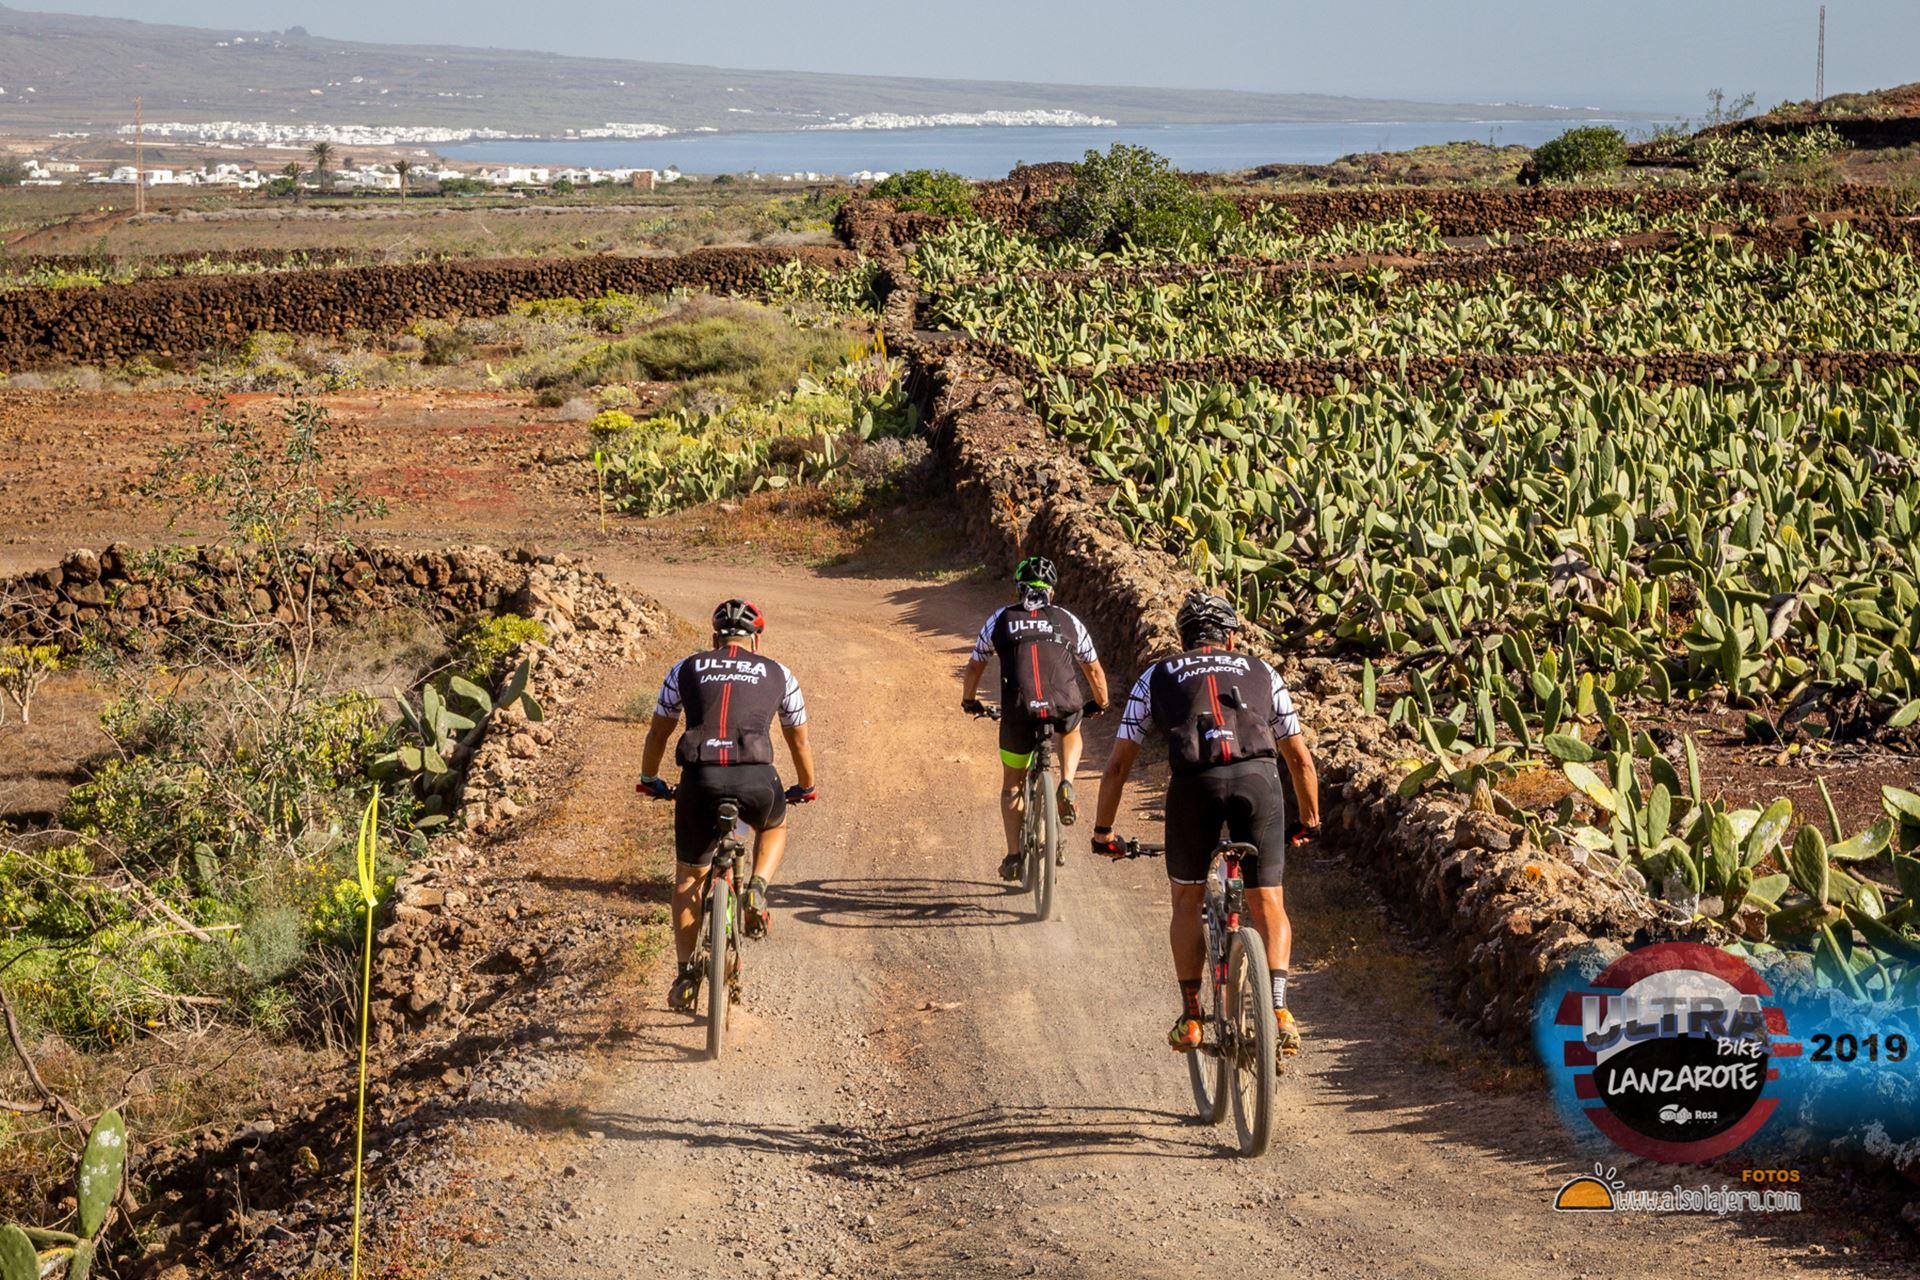 Sector Guatiza 2ª Etapa Ultrabike 2019 Fotos Alsolajero.com-184